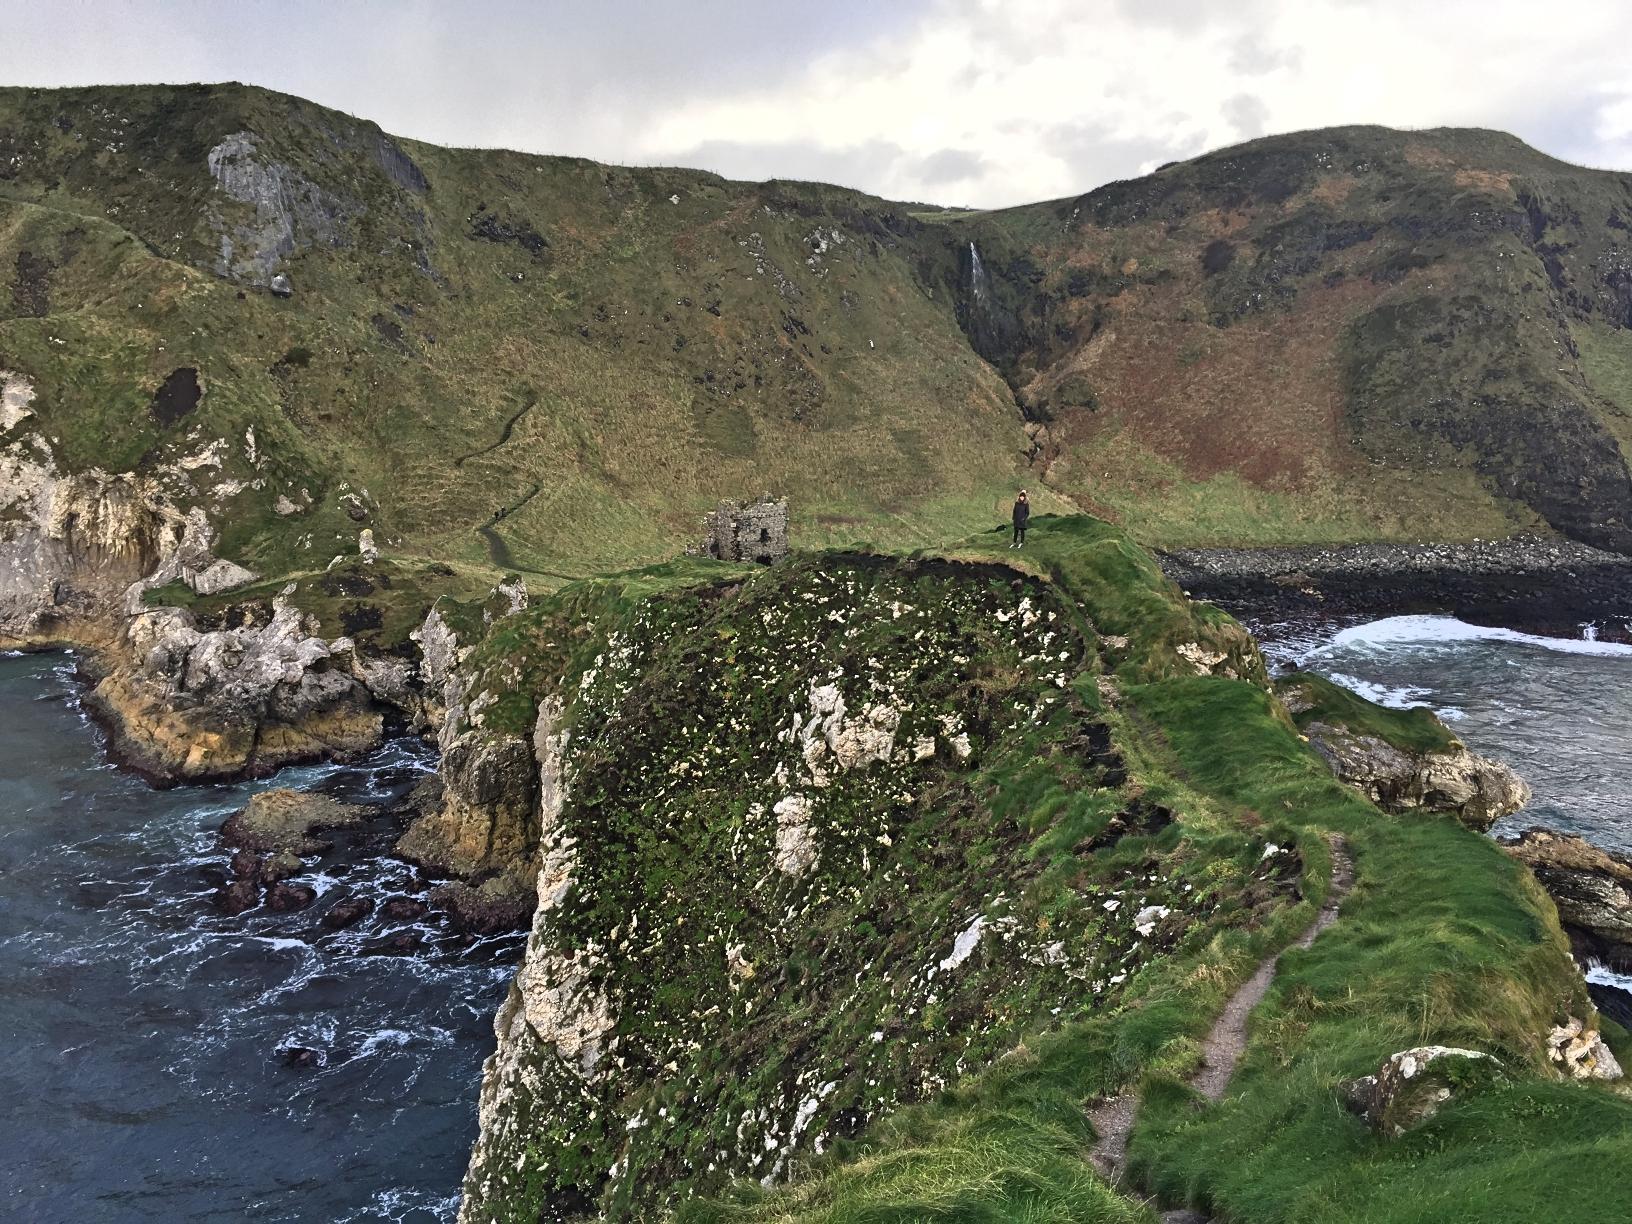 kinbane_head_castle_ni_explorer_northern_ireland (4).jpg